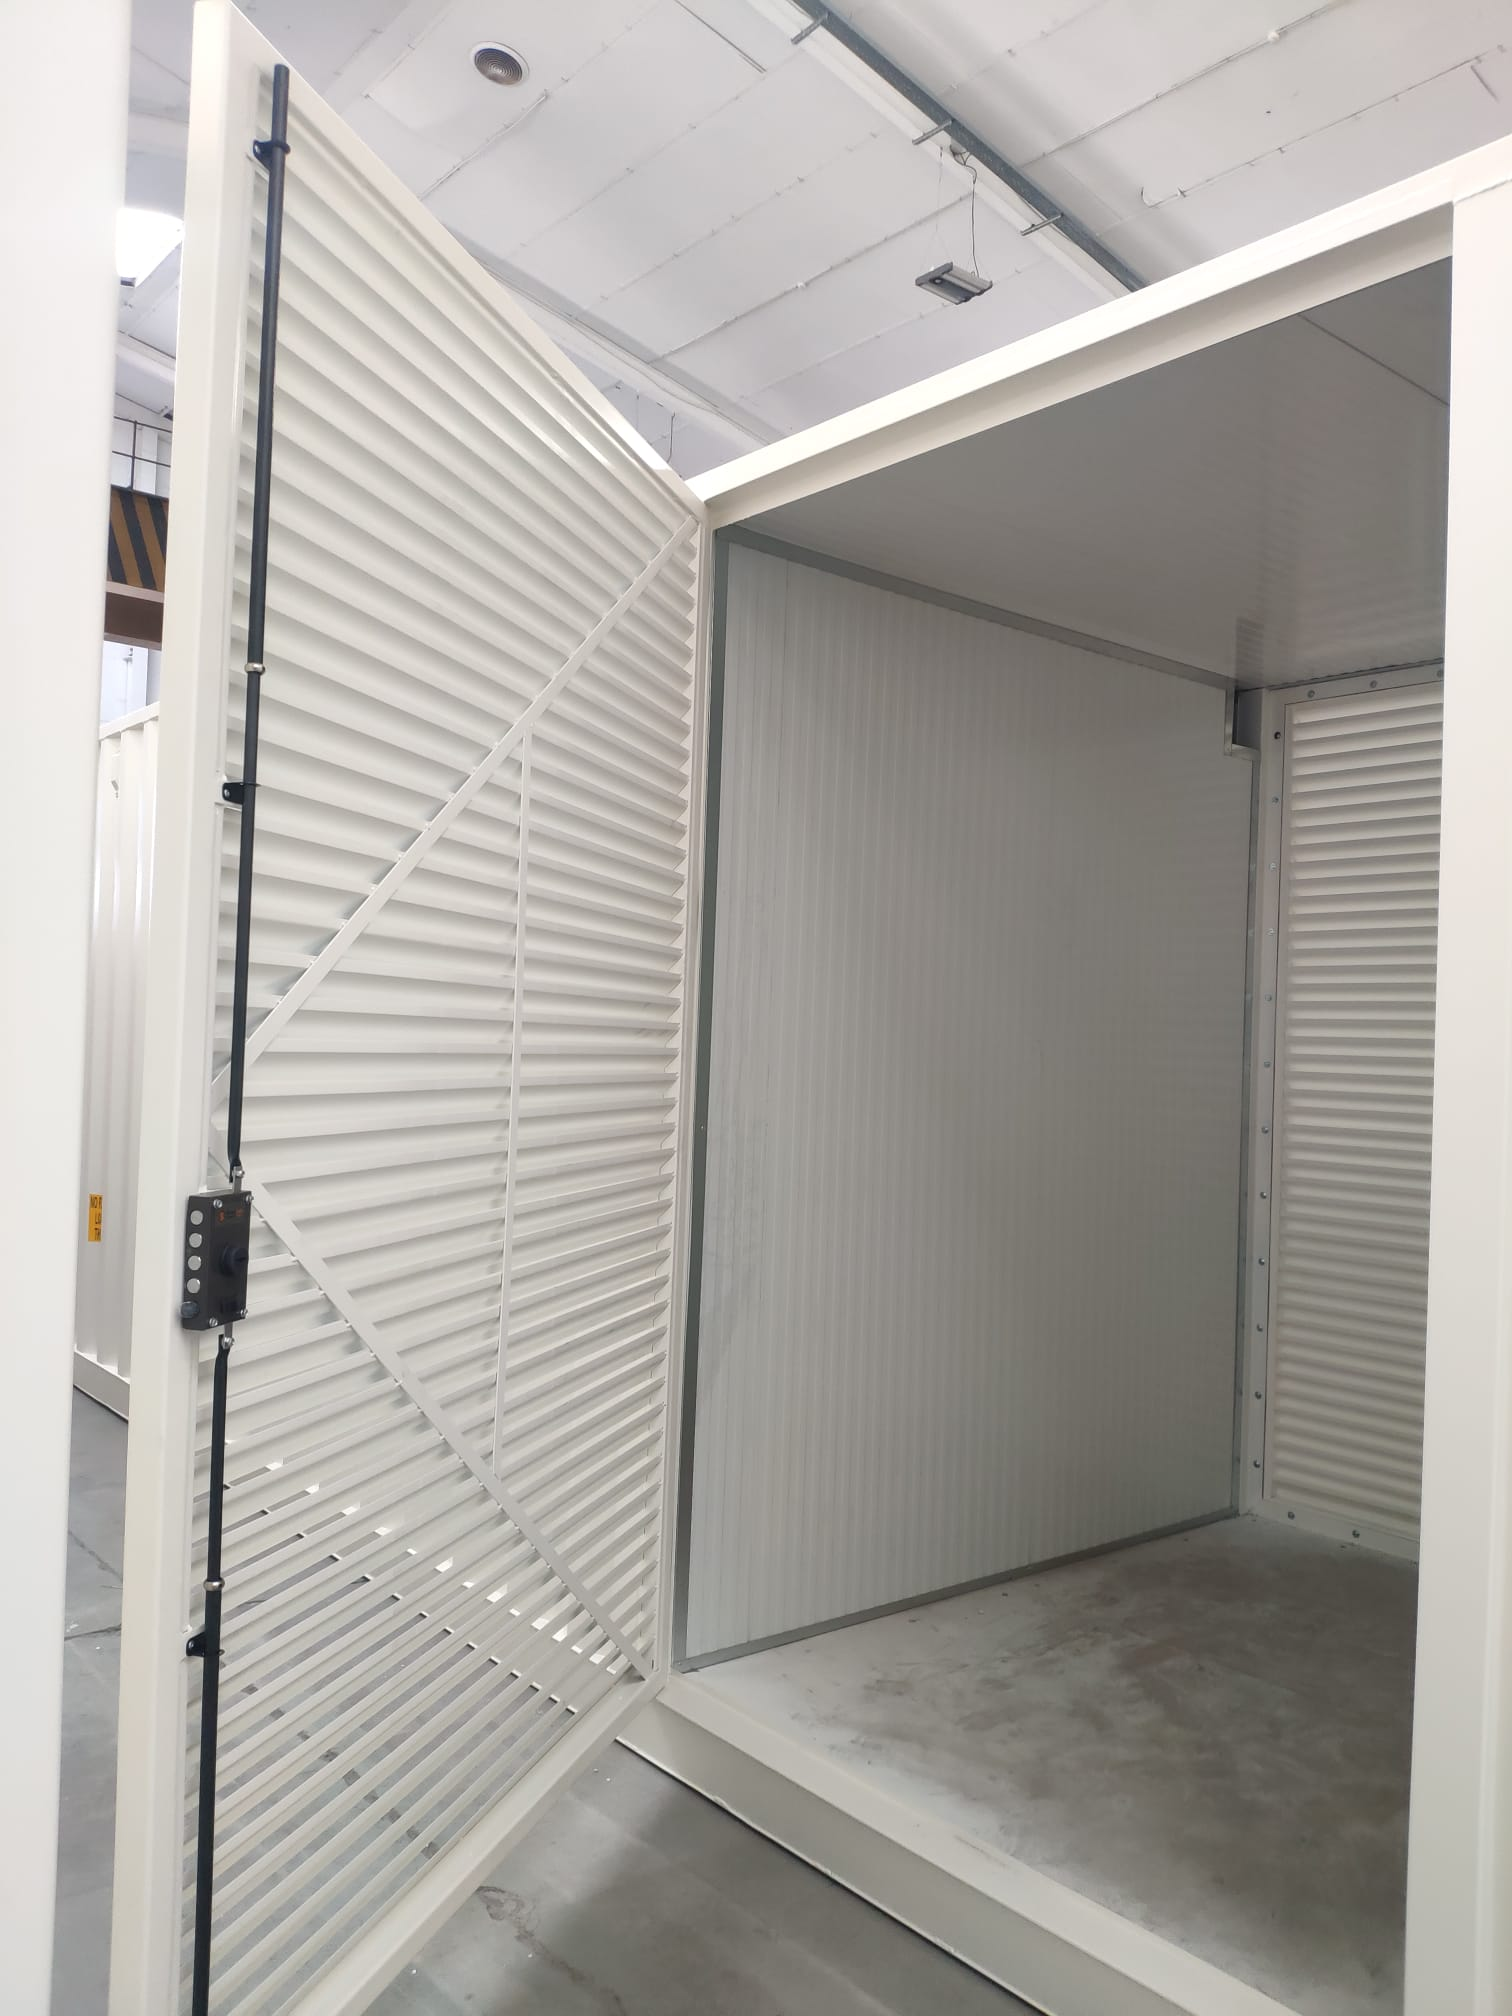 bullbox contenedores almacenamiento energia 03 - Containers for Energy Stockage